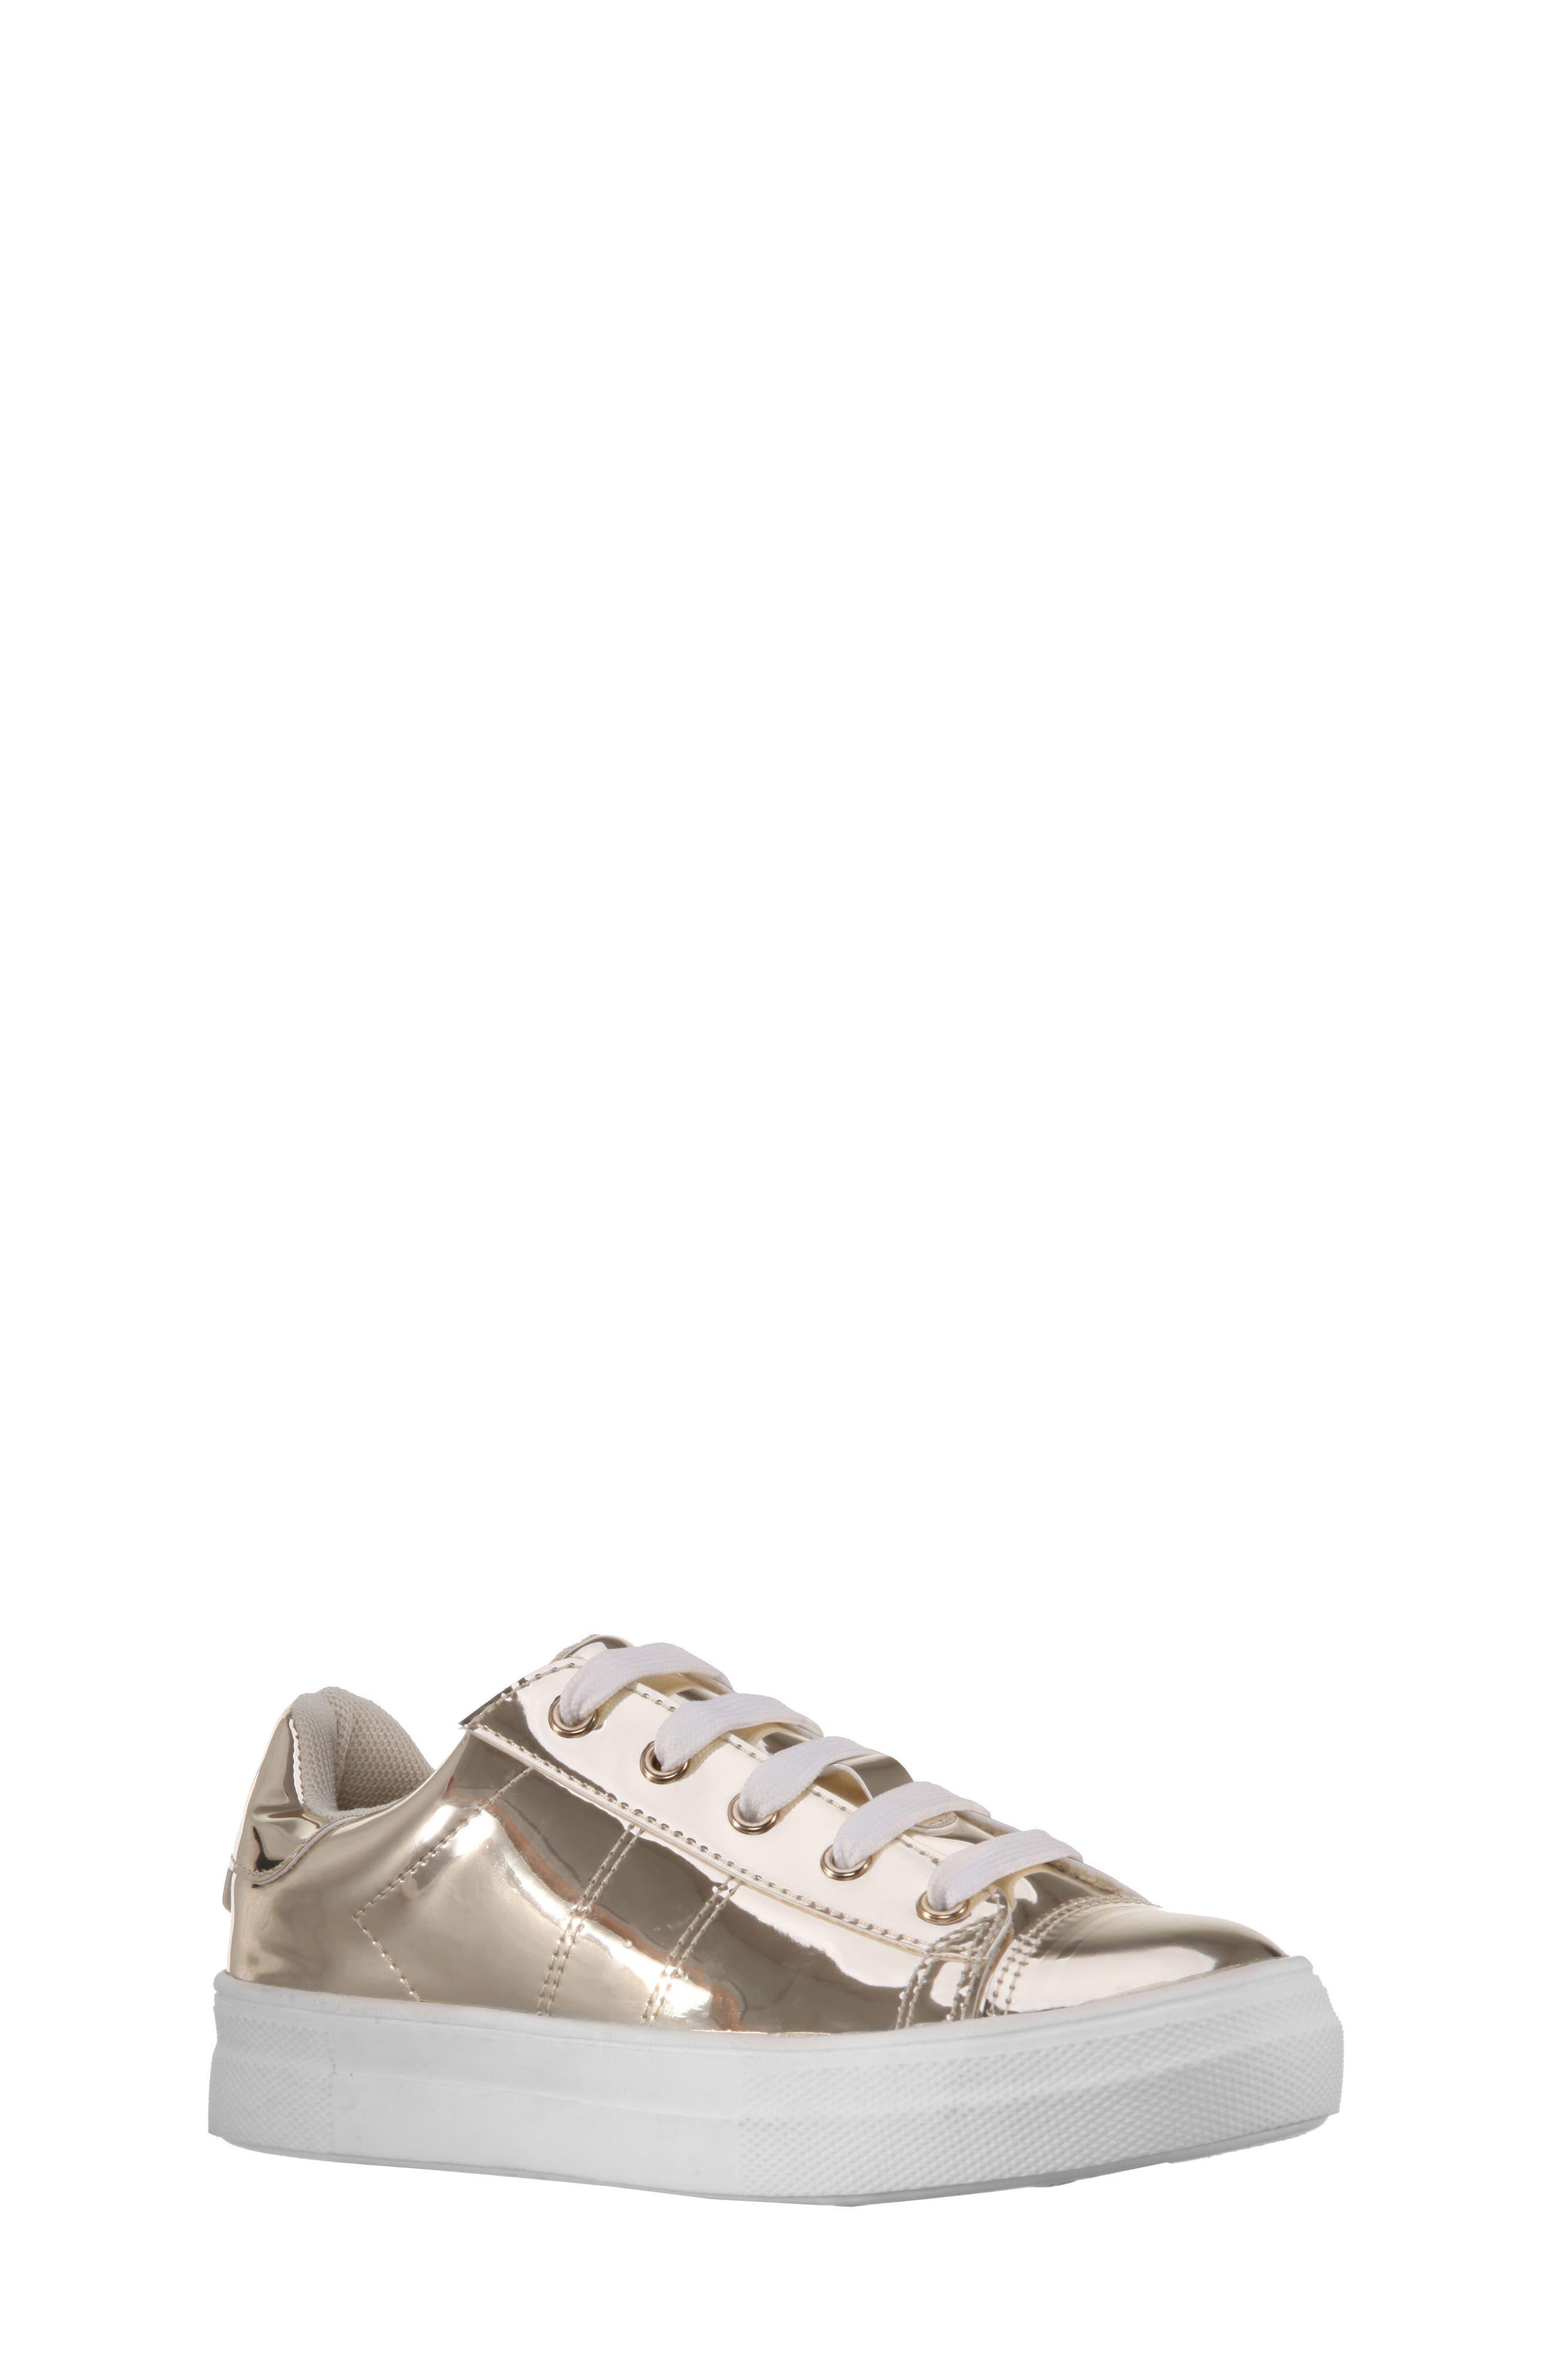 Rochella Metallic Sneaker,                             Main thumbnail 1, color,                             Platino Mirror Metallic